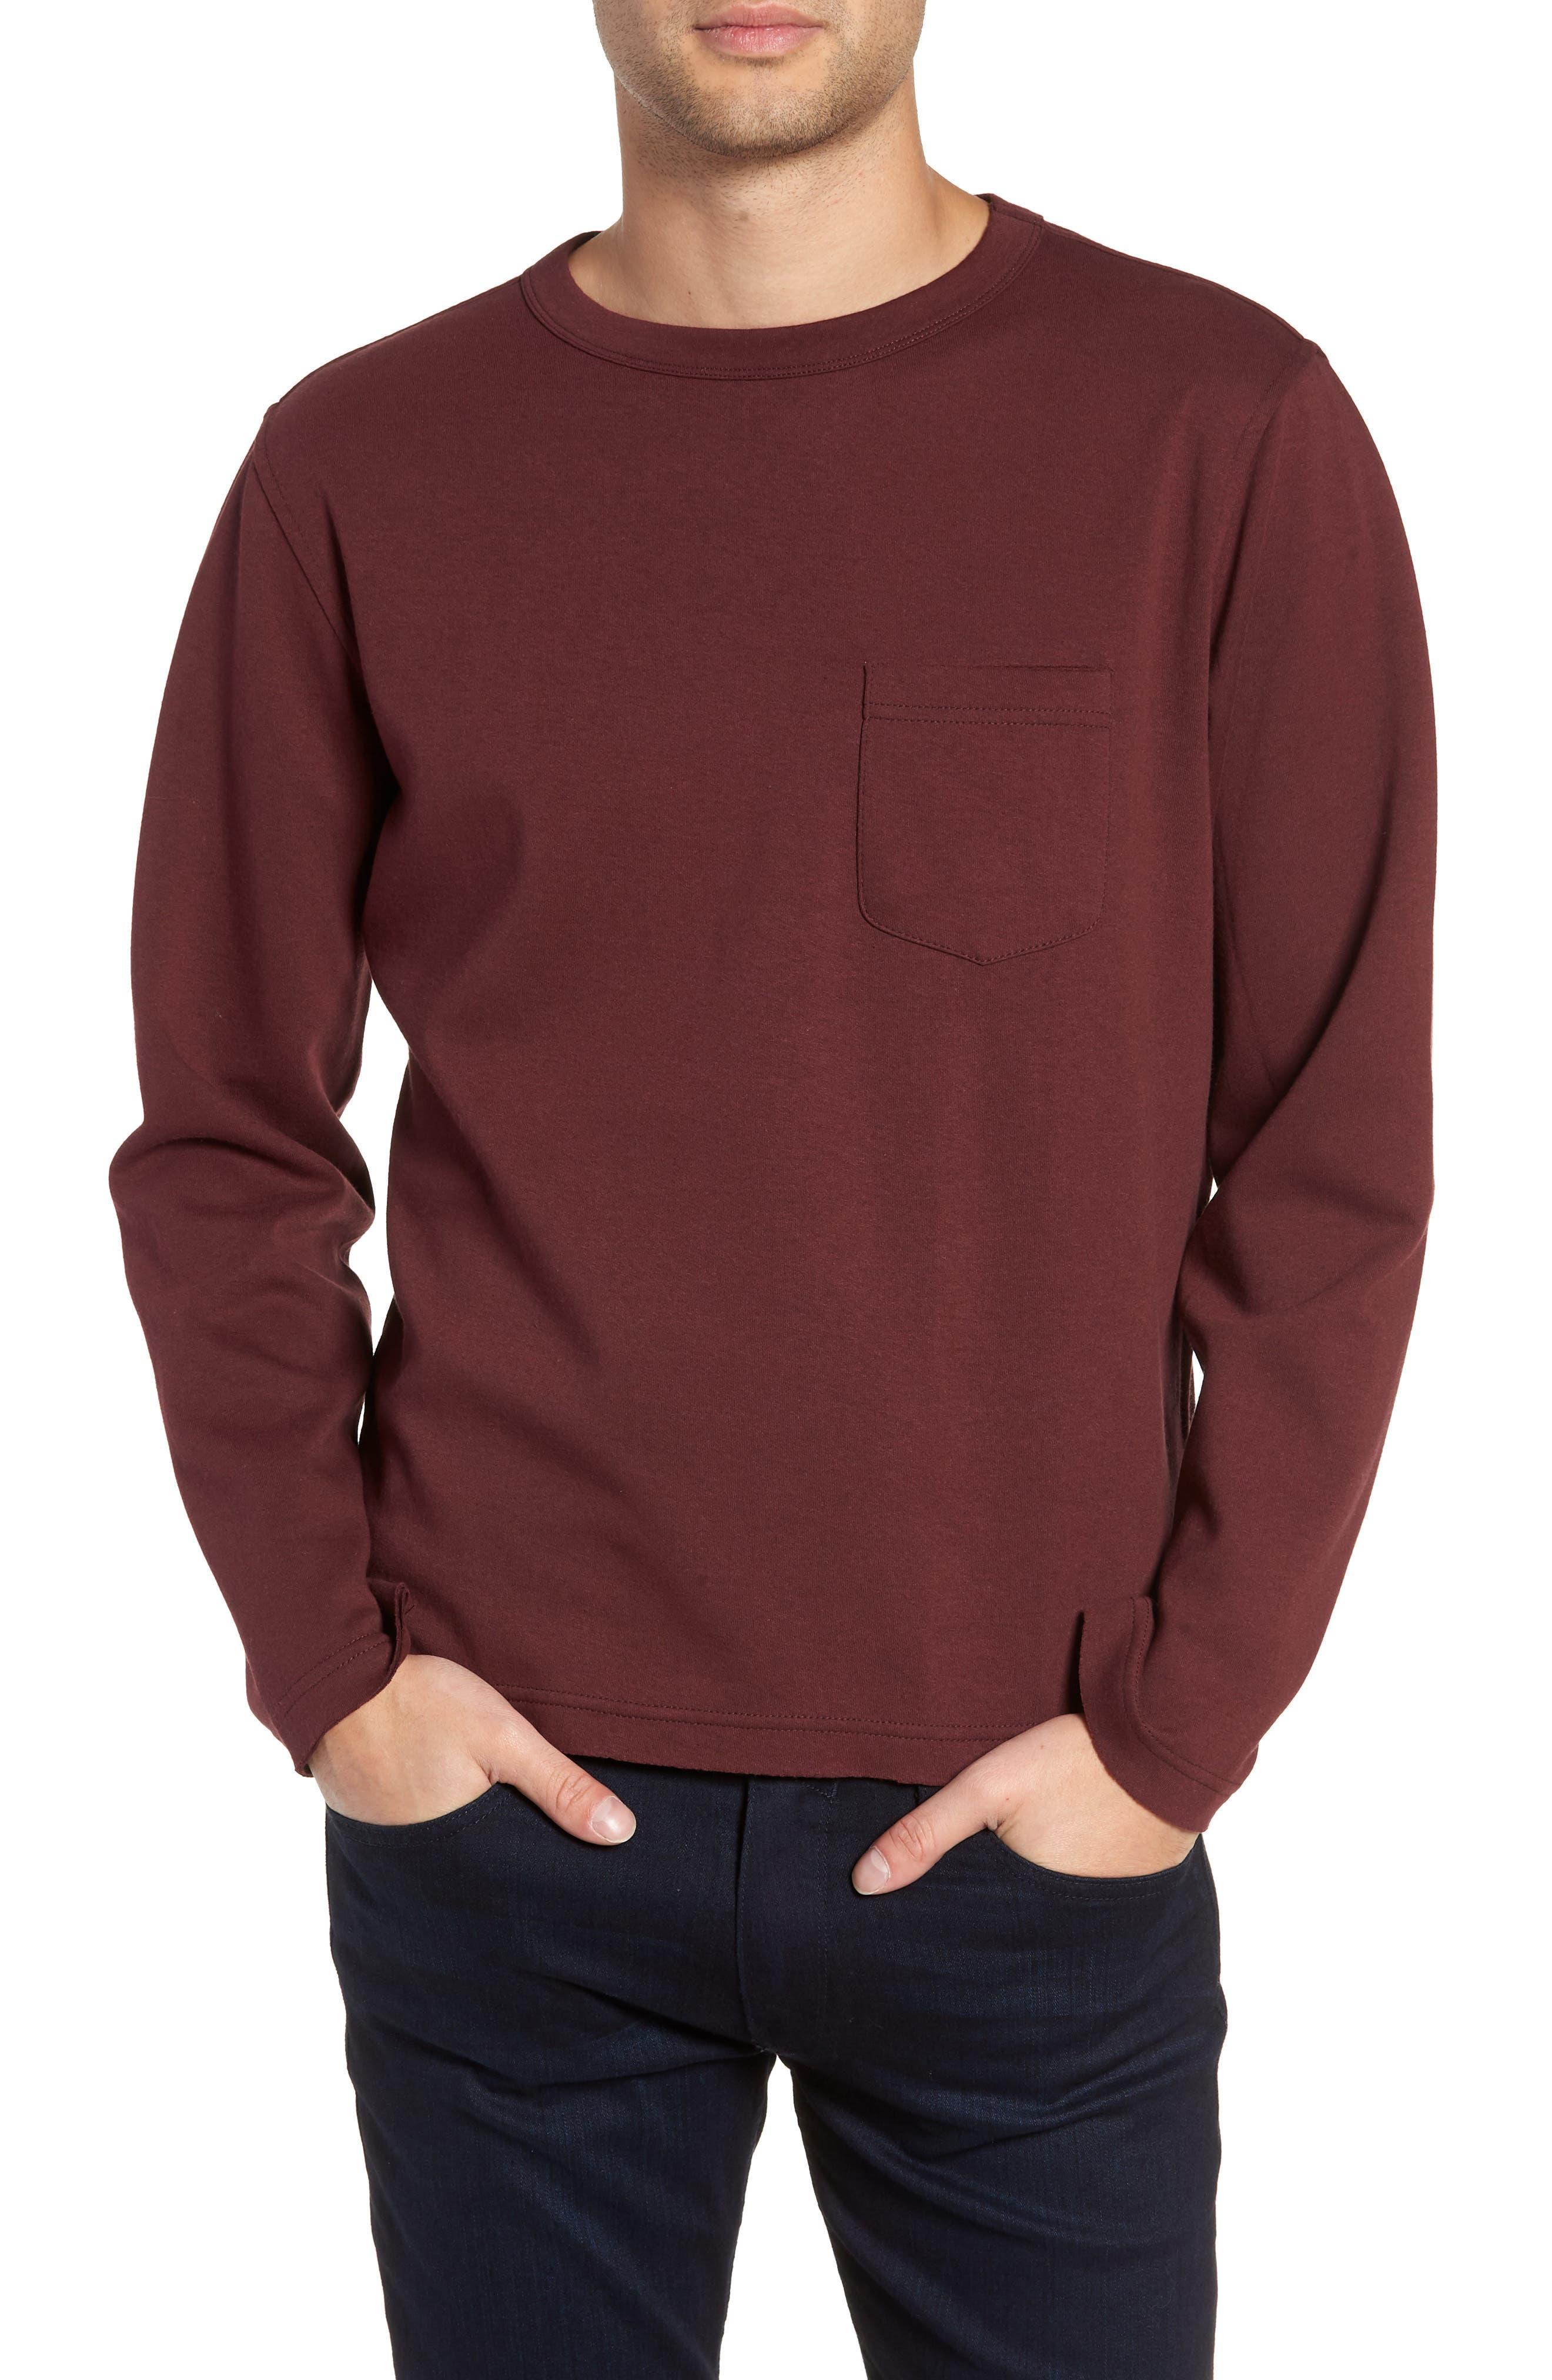 Twentymetrictons Trim Fit Long Sleeve Pocket T-Shirt, Red